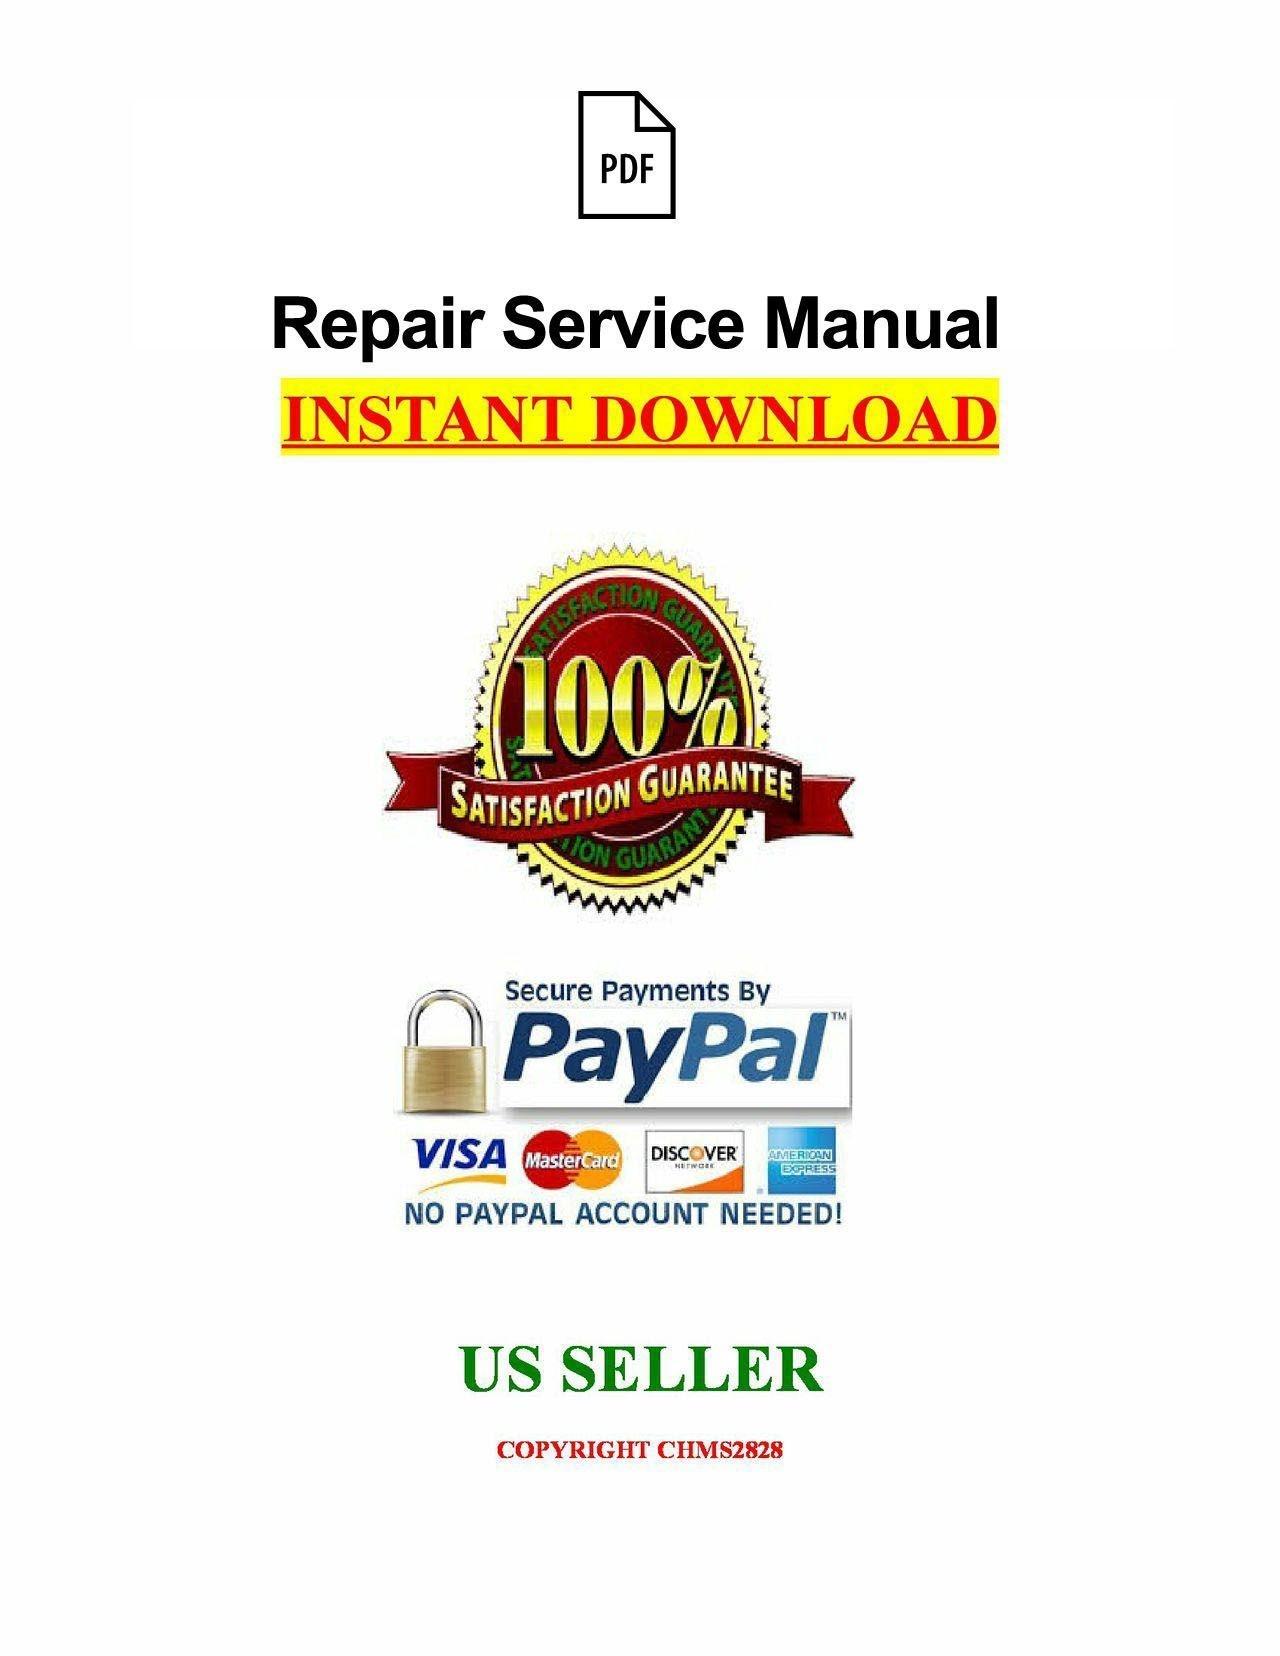 Canon DADF-D1 Service Repair & Parts Manual DOWNLOAD